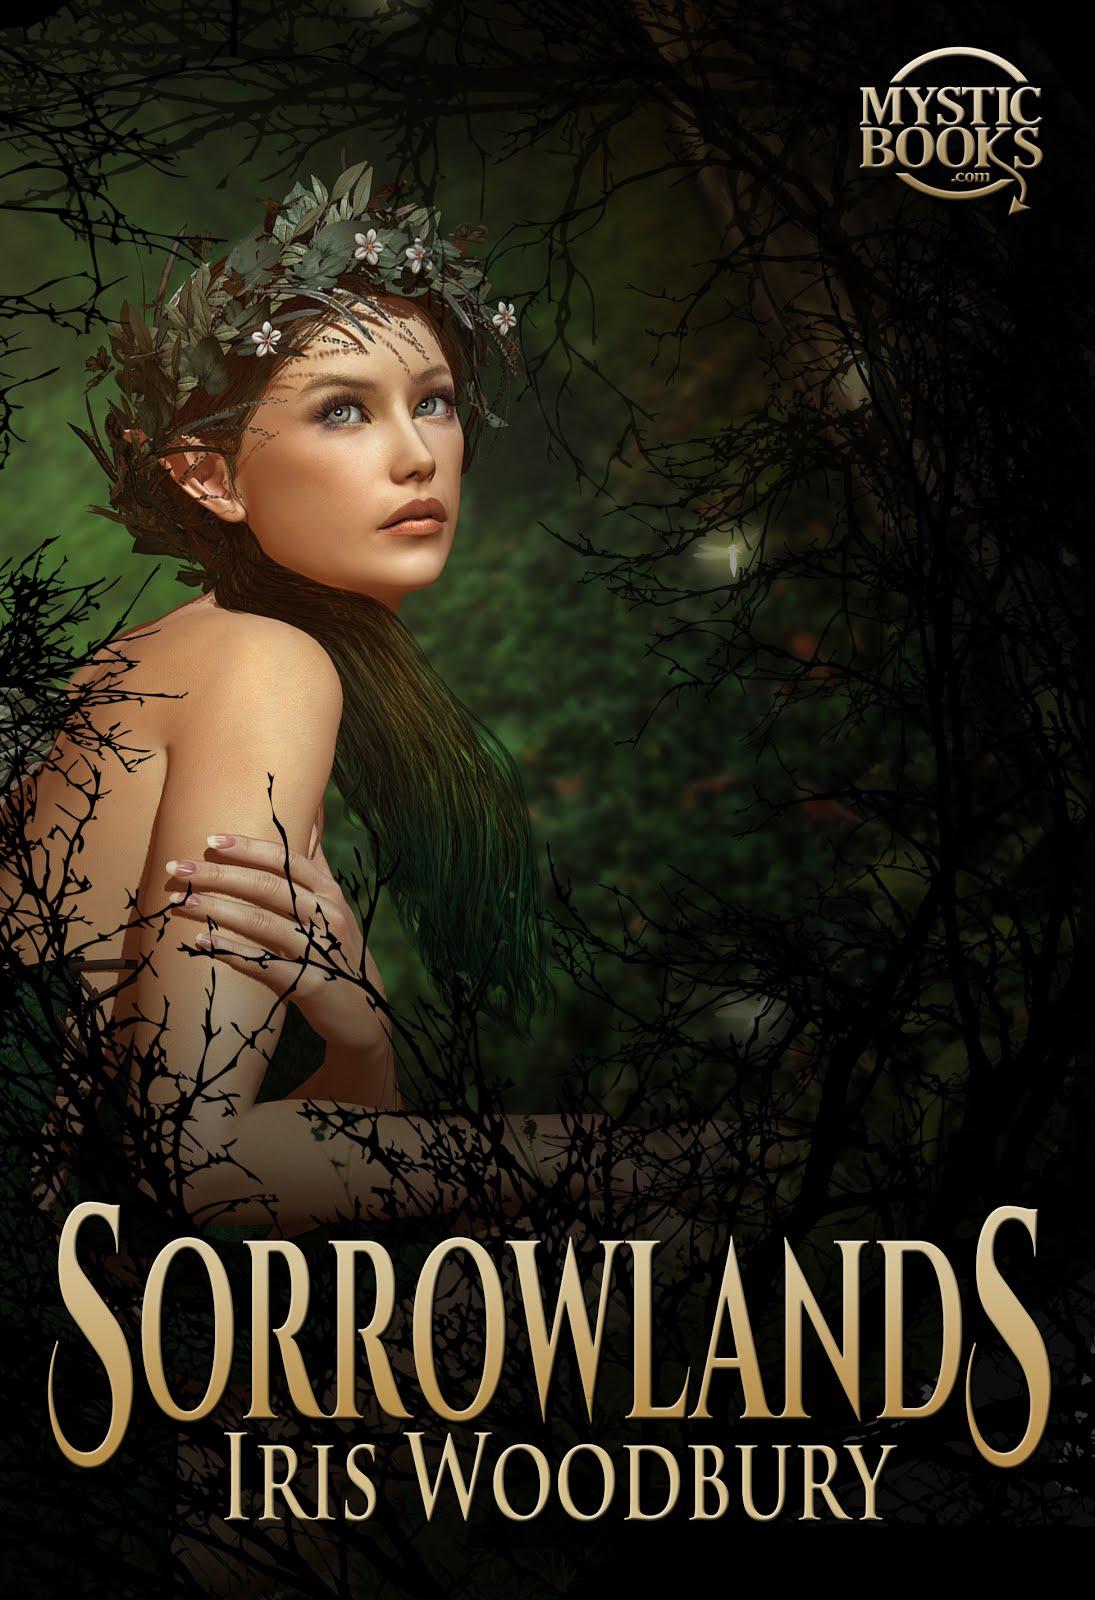 Sorrowlands